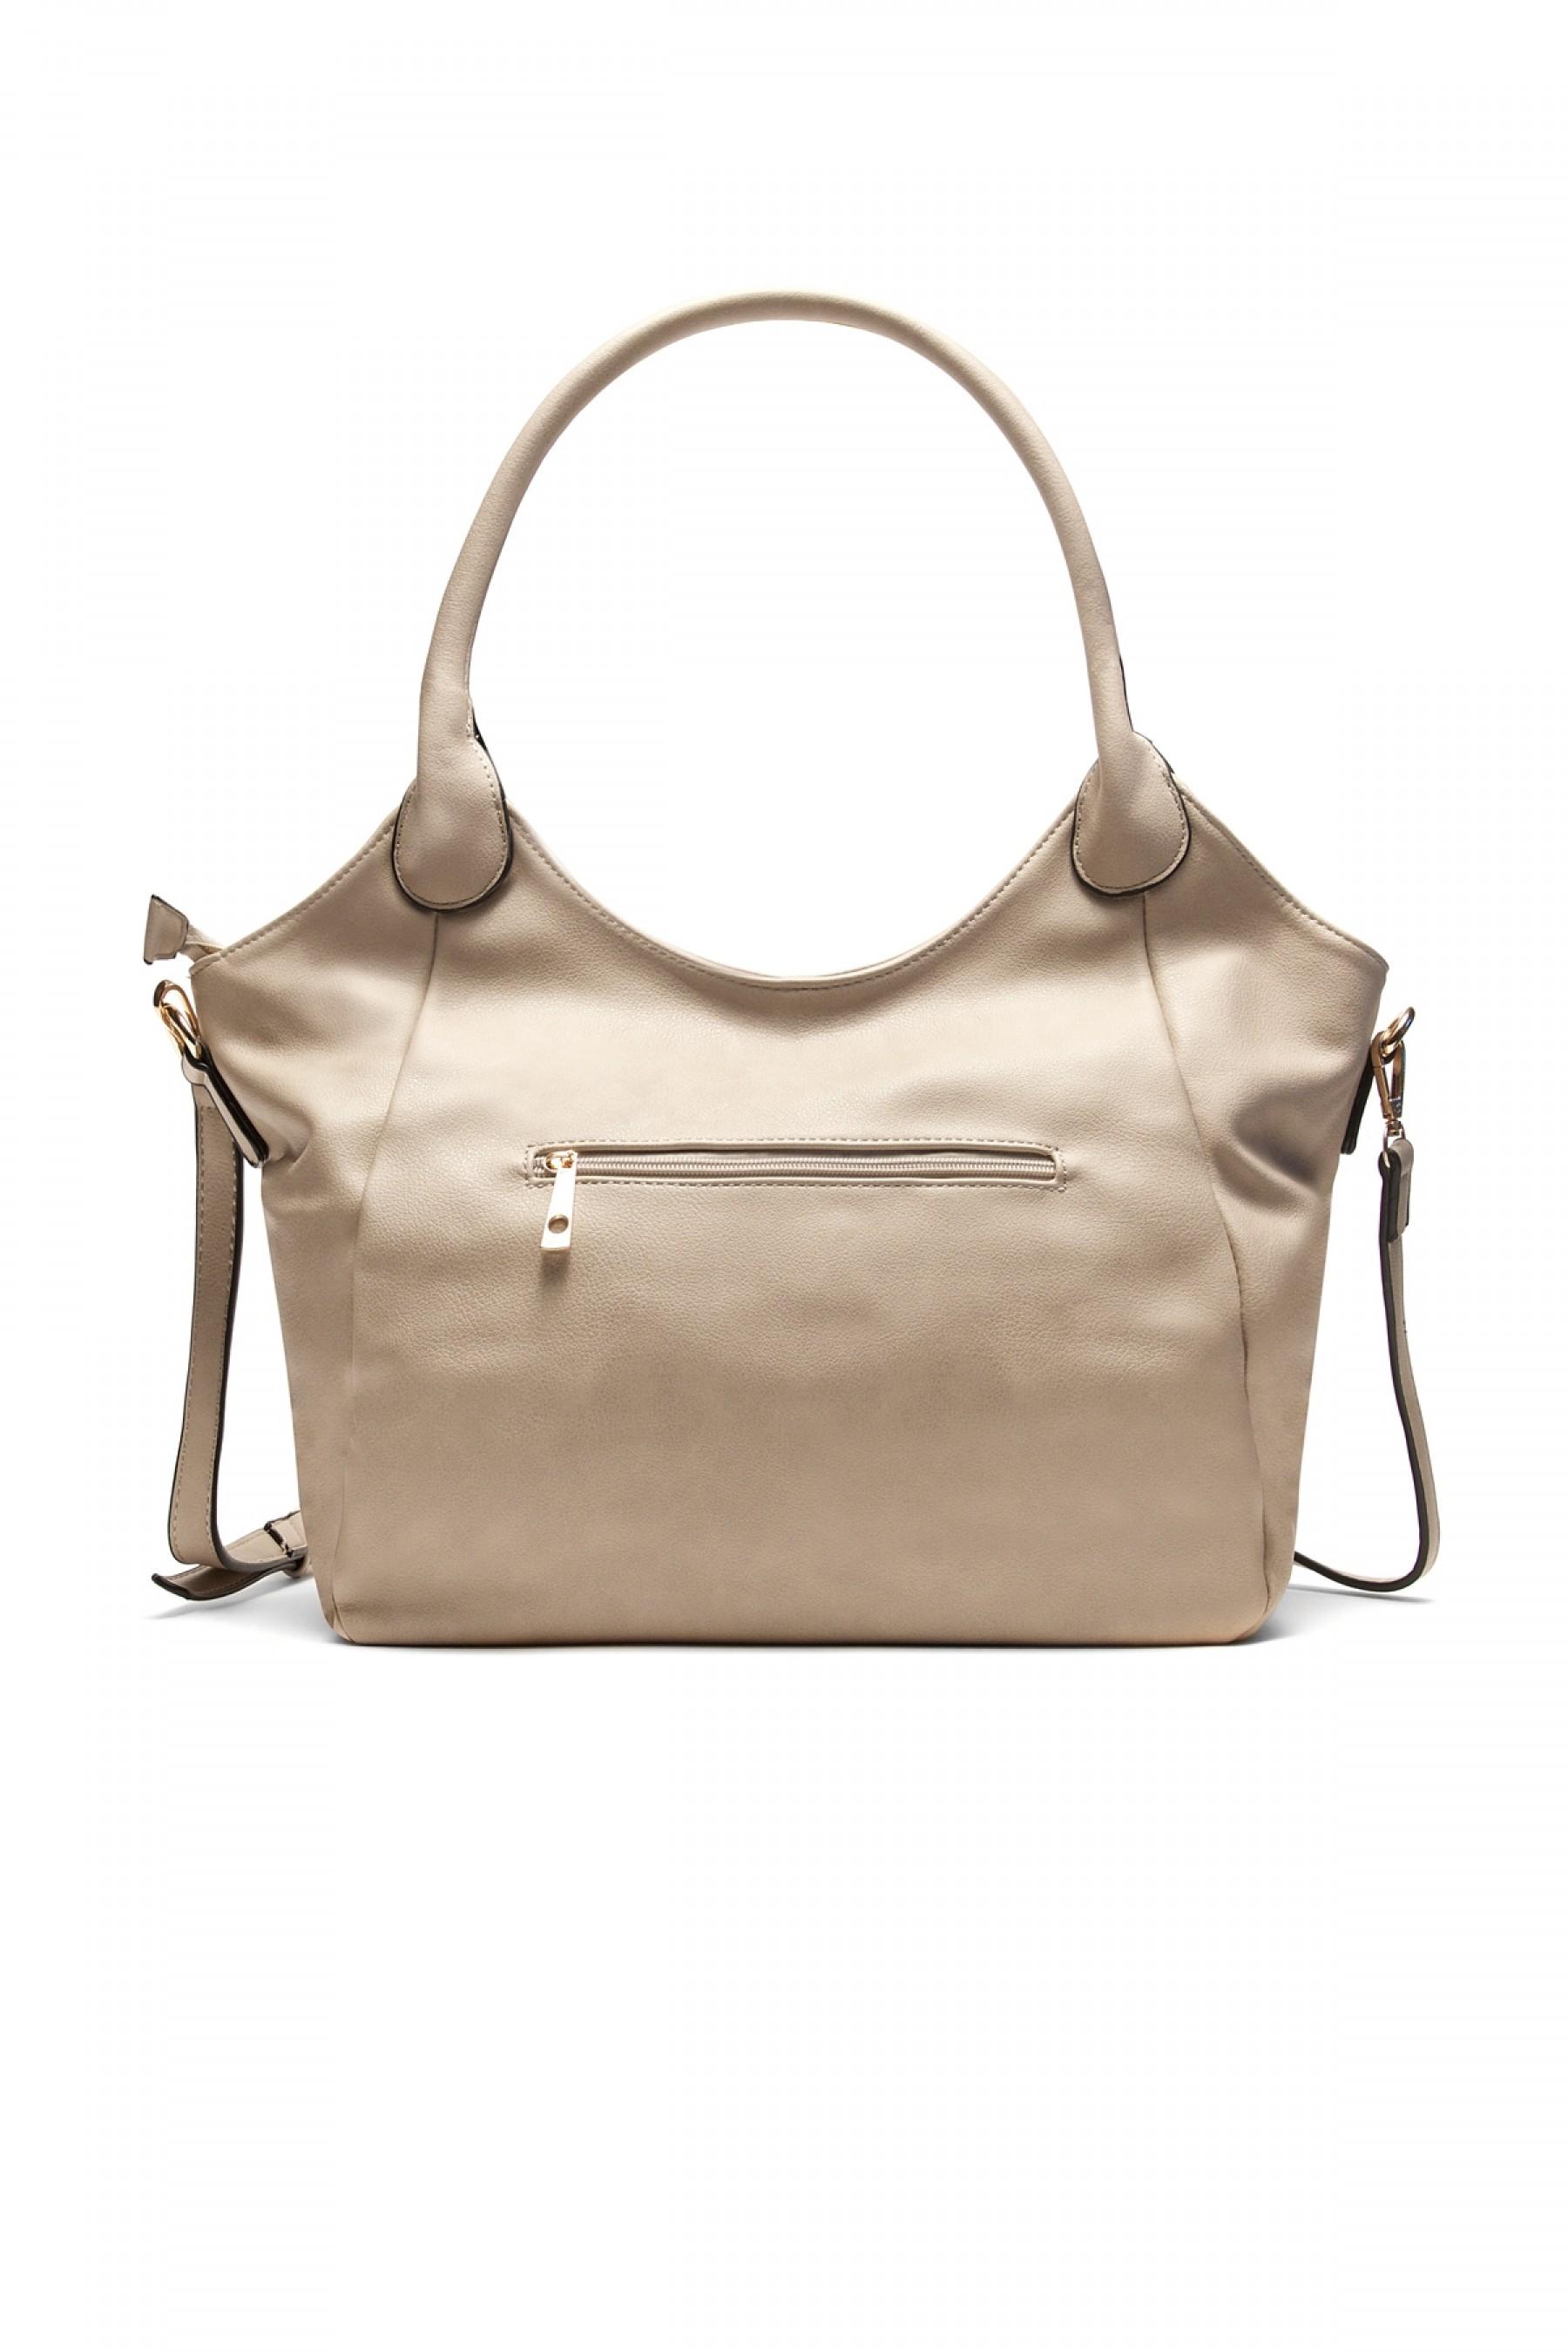 SLC-662661- Classic Simple Top Handle Bag (Khaki)